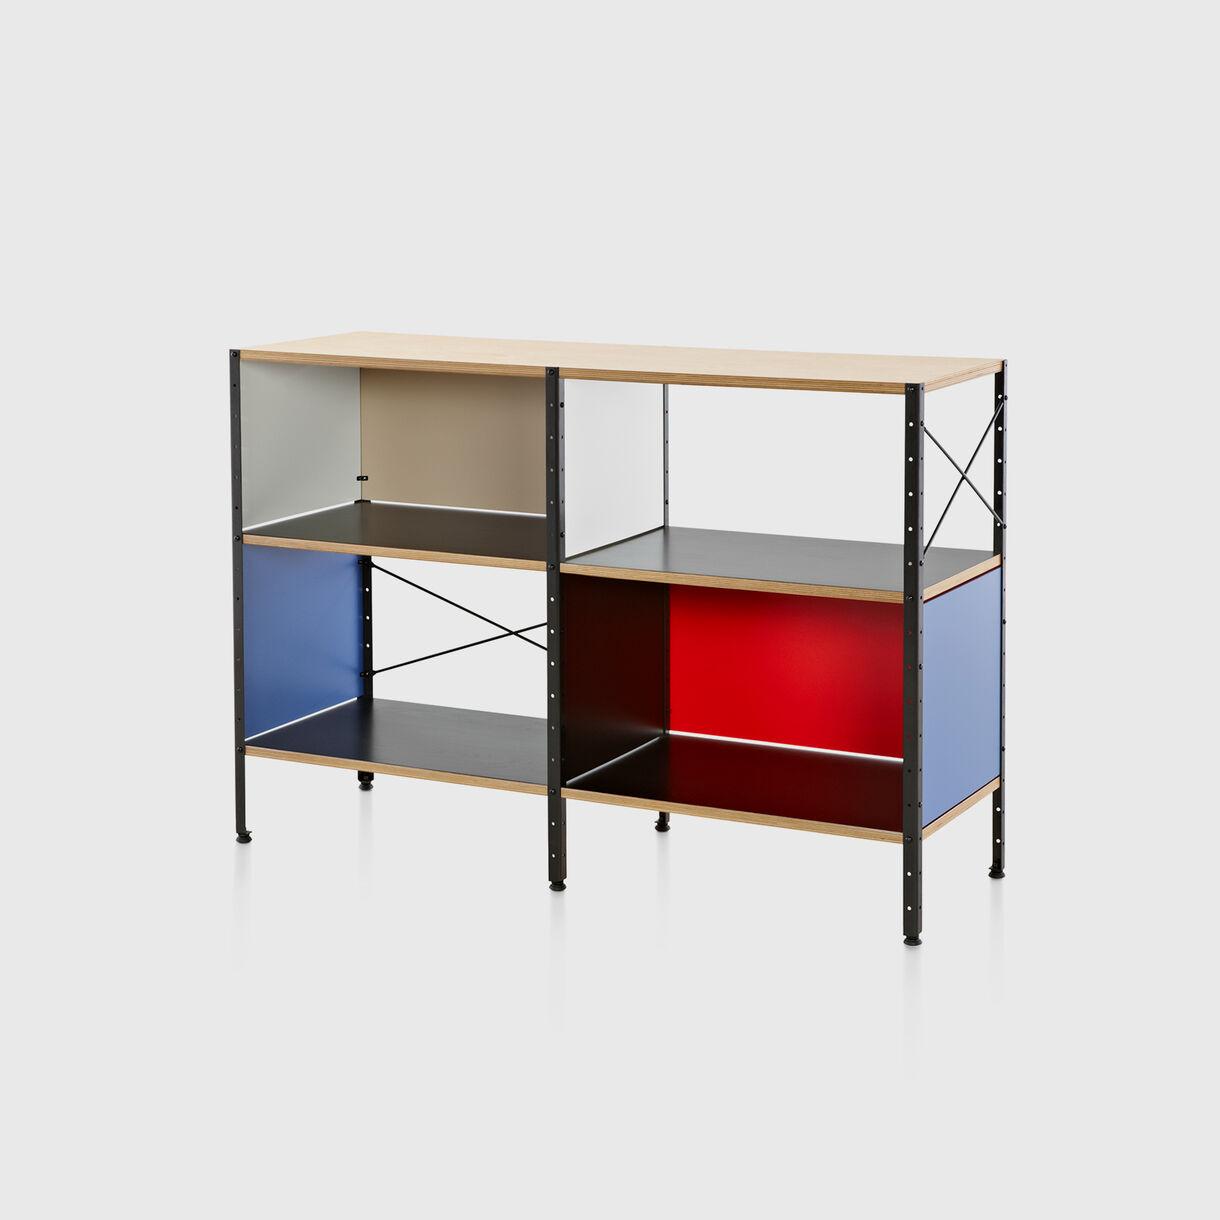 Eames Storage Unit, 2x2